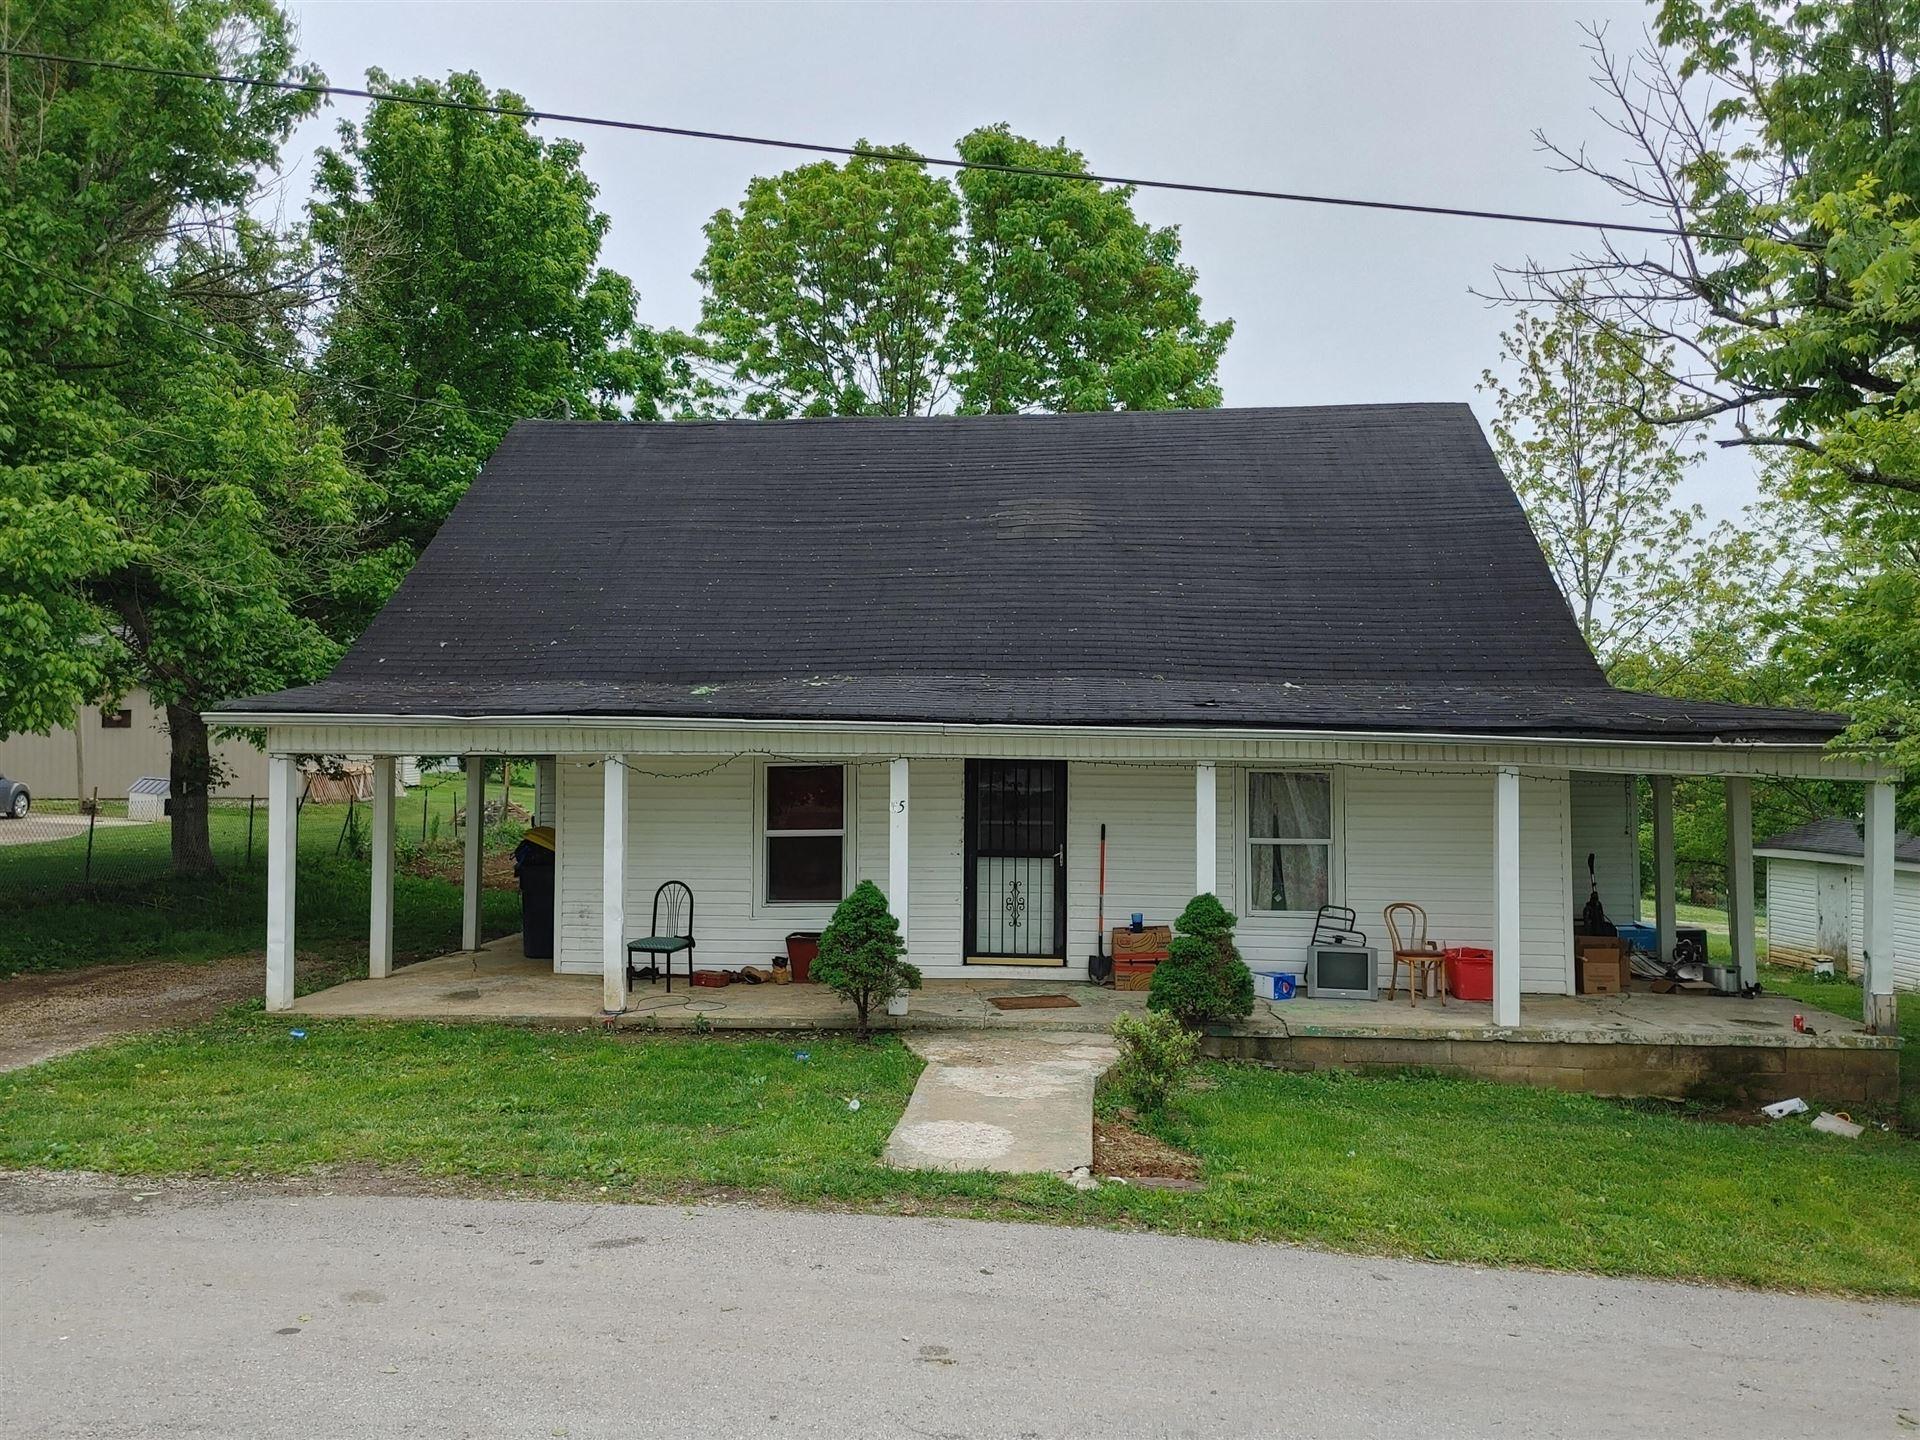 45 Dailey, Mount Vernon, KY 40456 - MLS#: 20108873